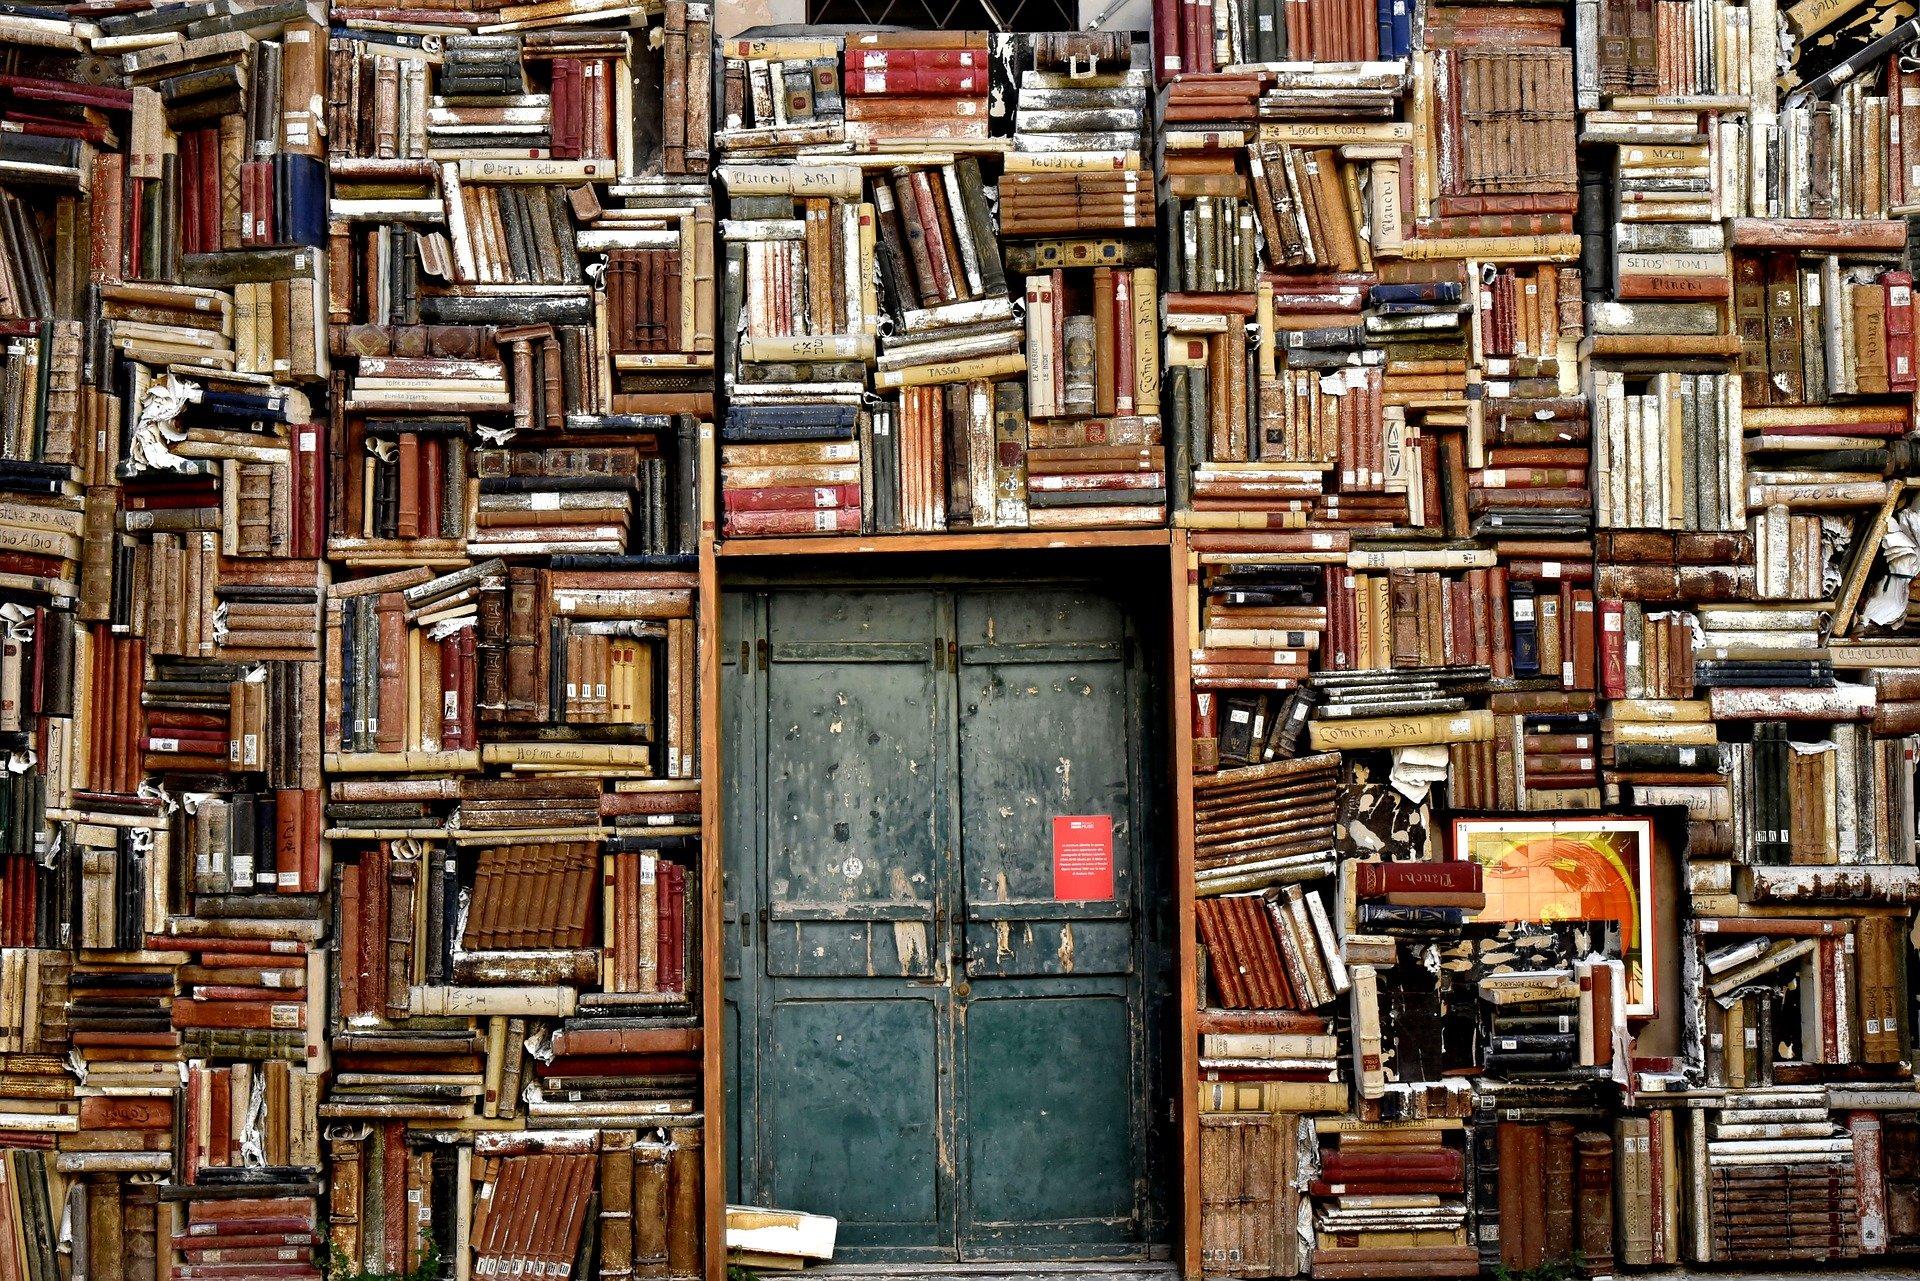 Bücherregal. ninocare @ pixabay.com